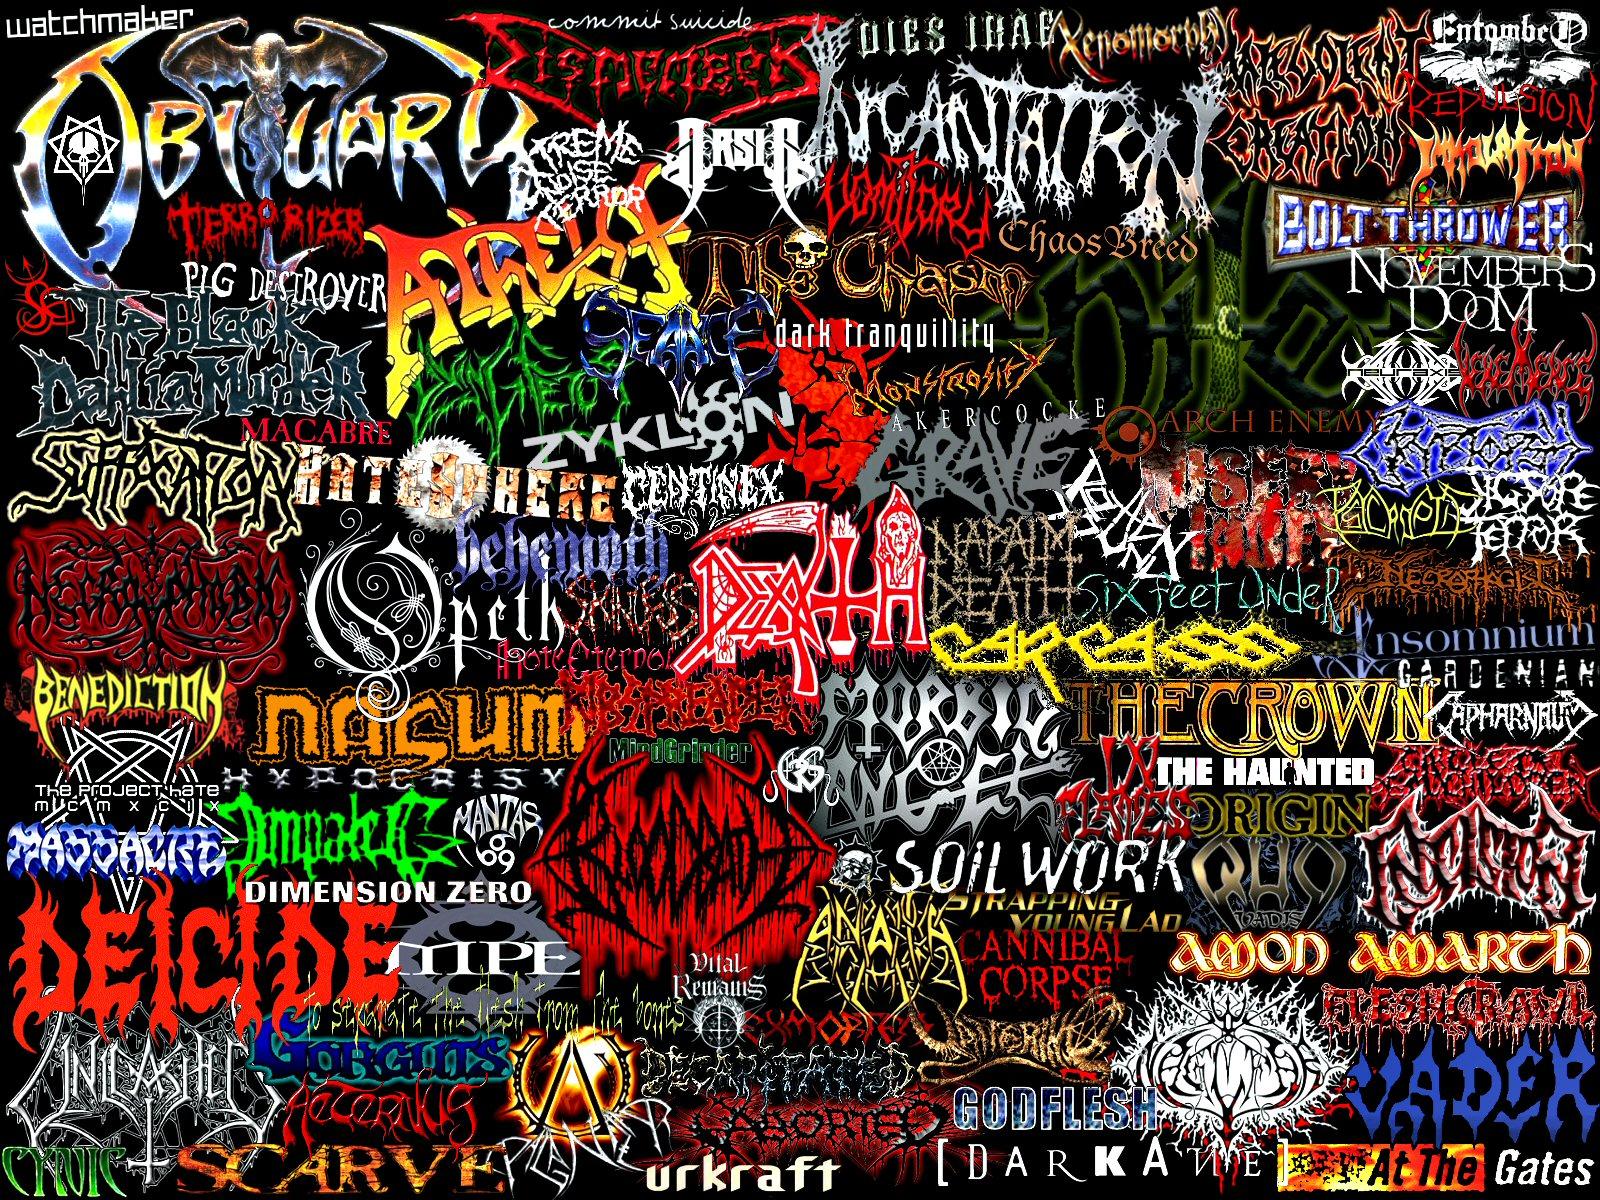 http://2.bp.blogspot.com/_z4VYhlb8WmQ/TO1sHKVfg_I/AAAAAAAAApk/j2xH-QYD8KE/s1600/Bastion_Rock_wallpaper-146013.jpg